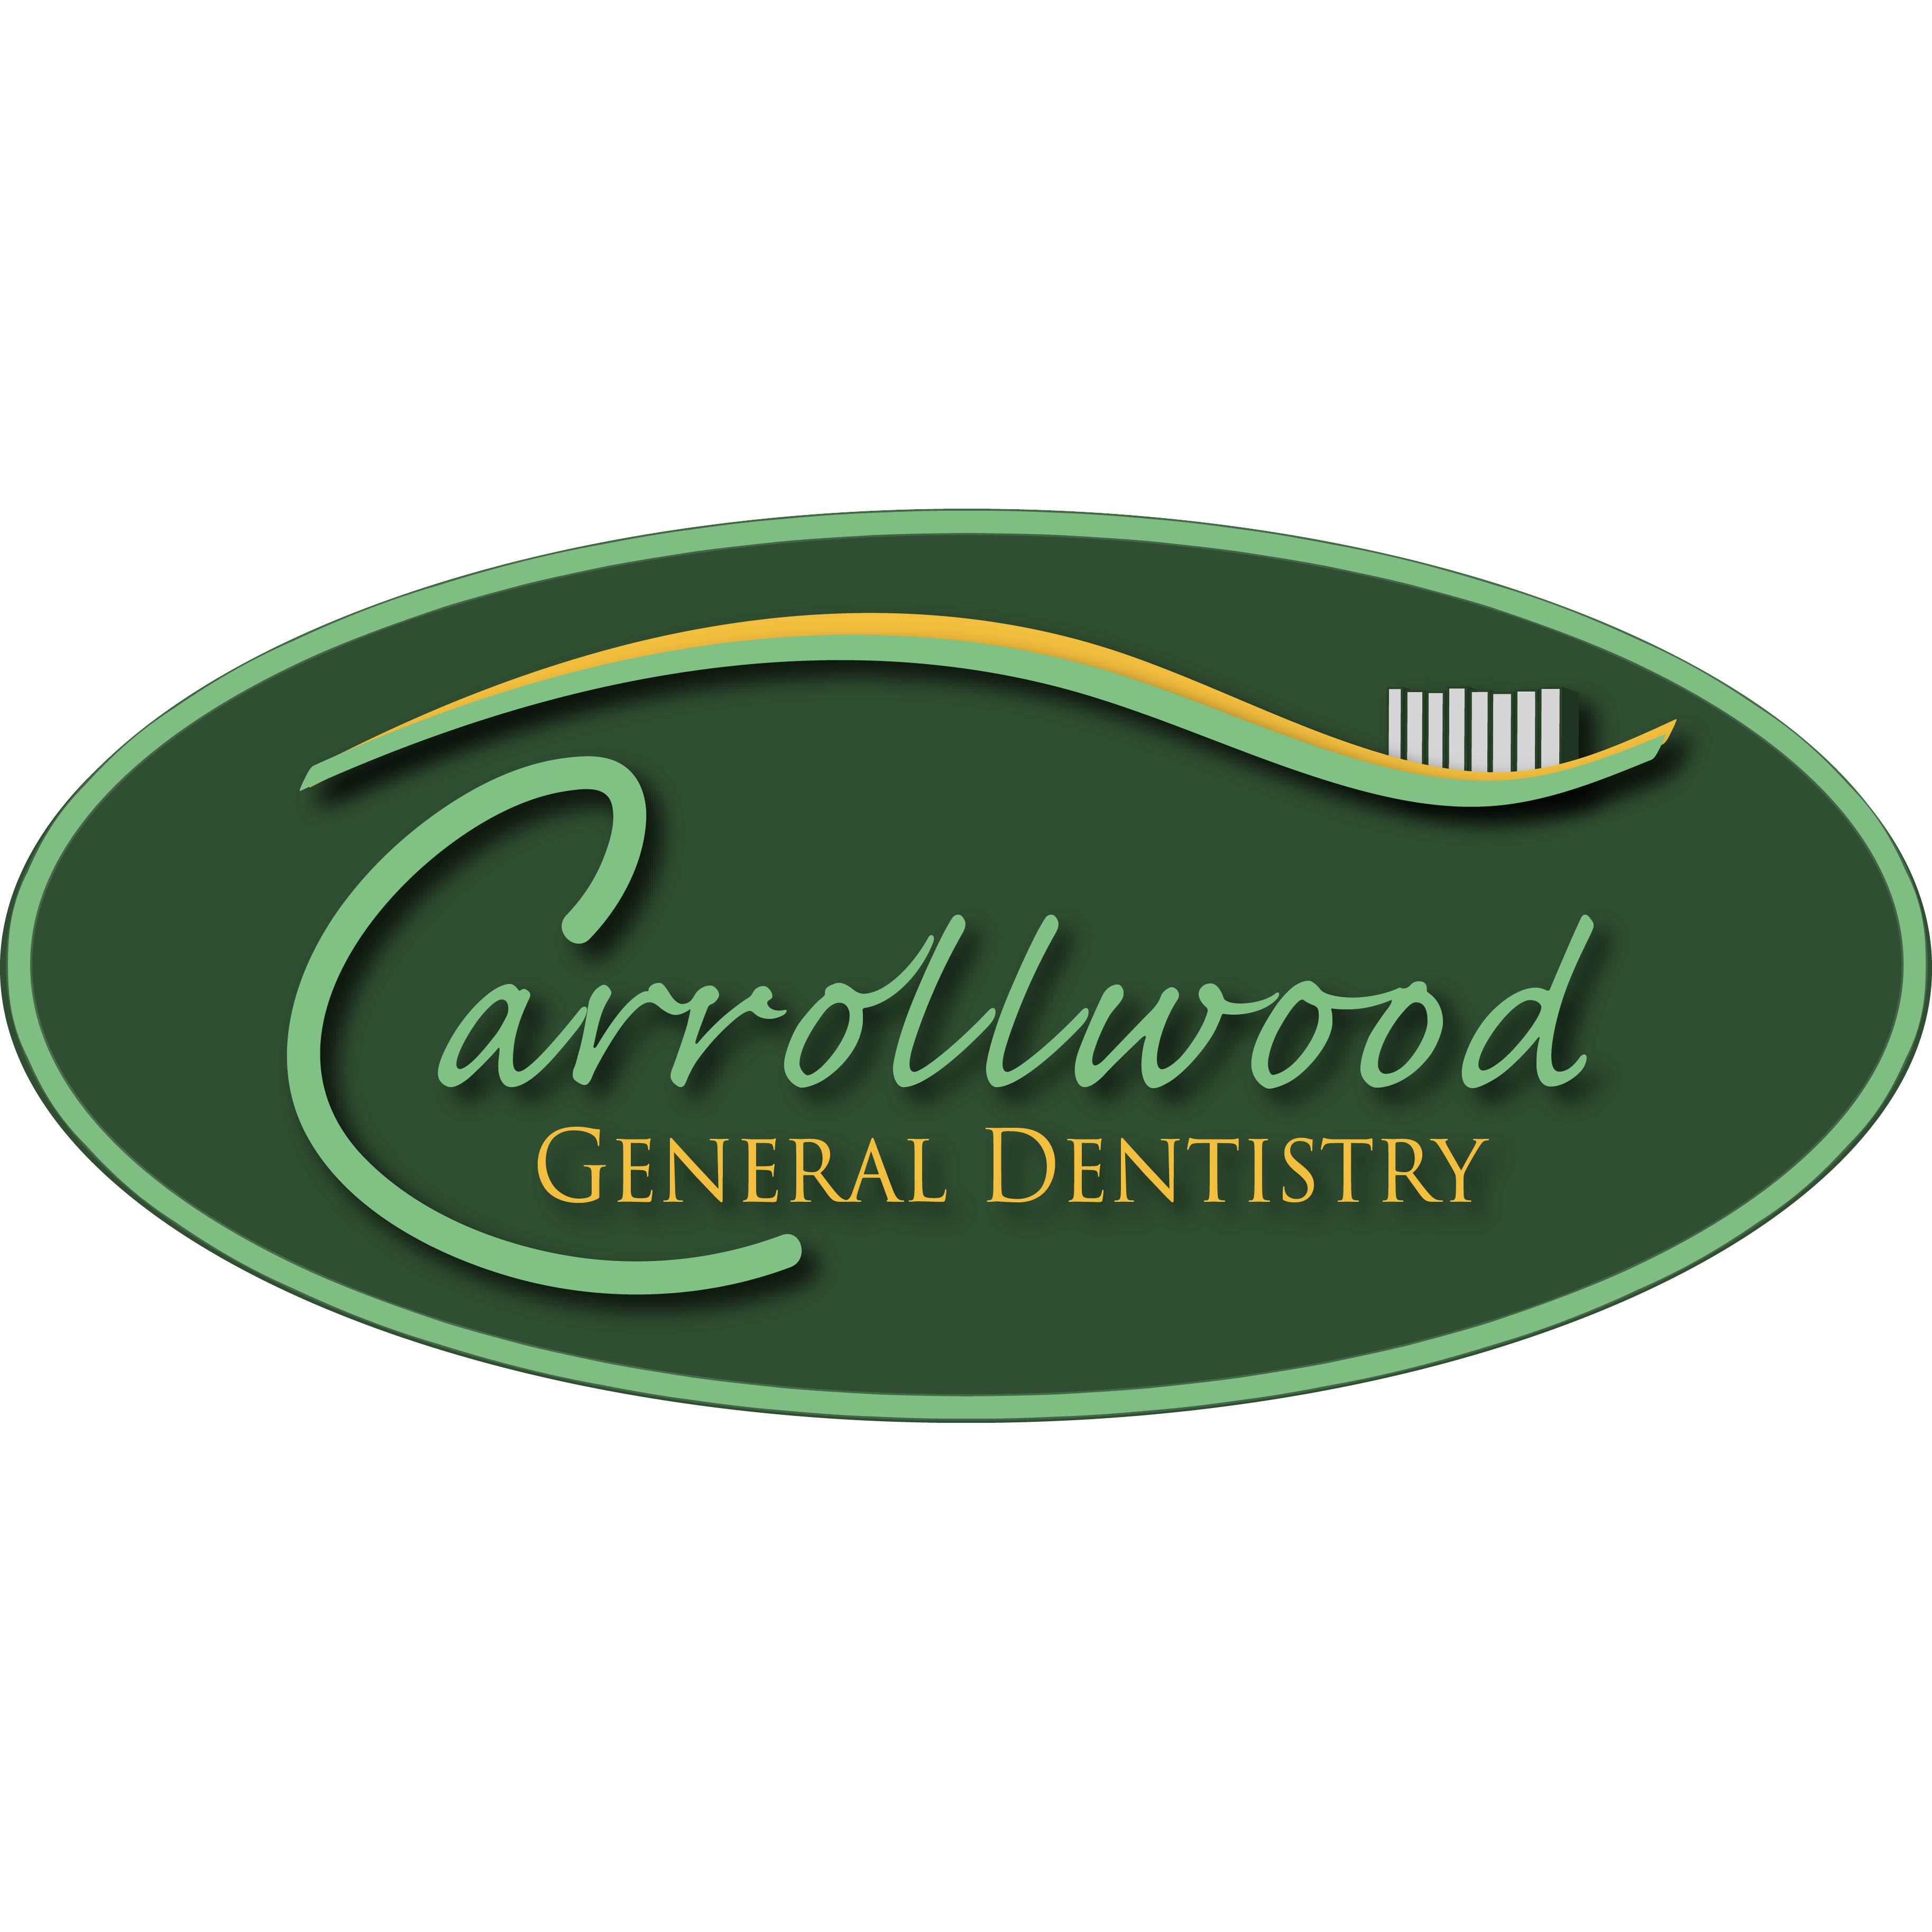 Carrollwood General Dentistry